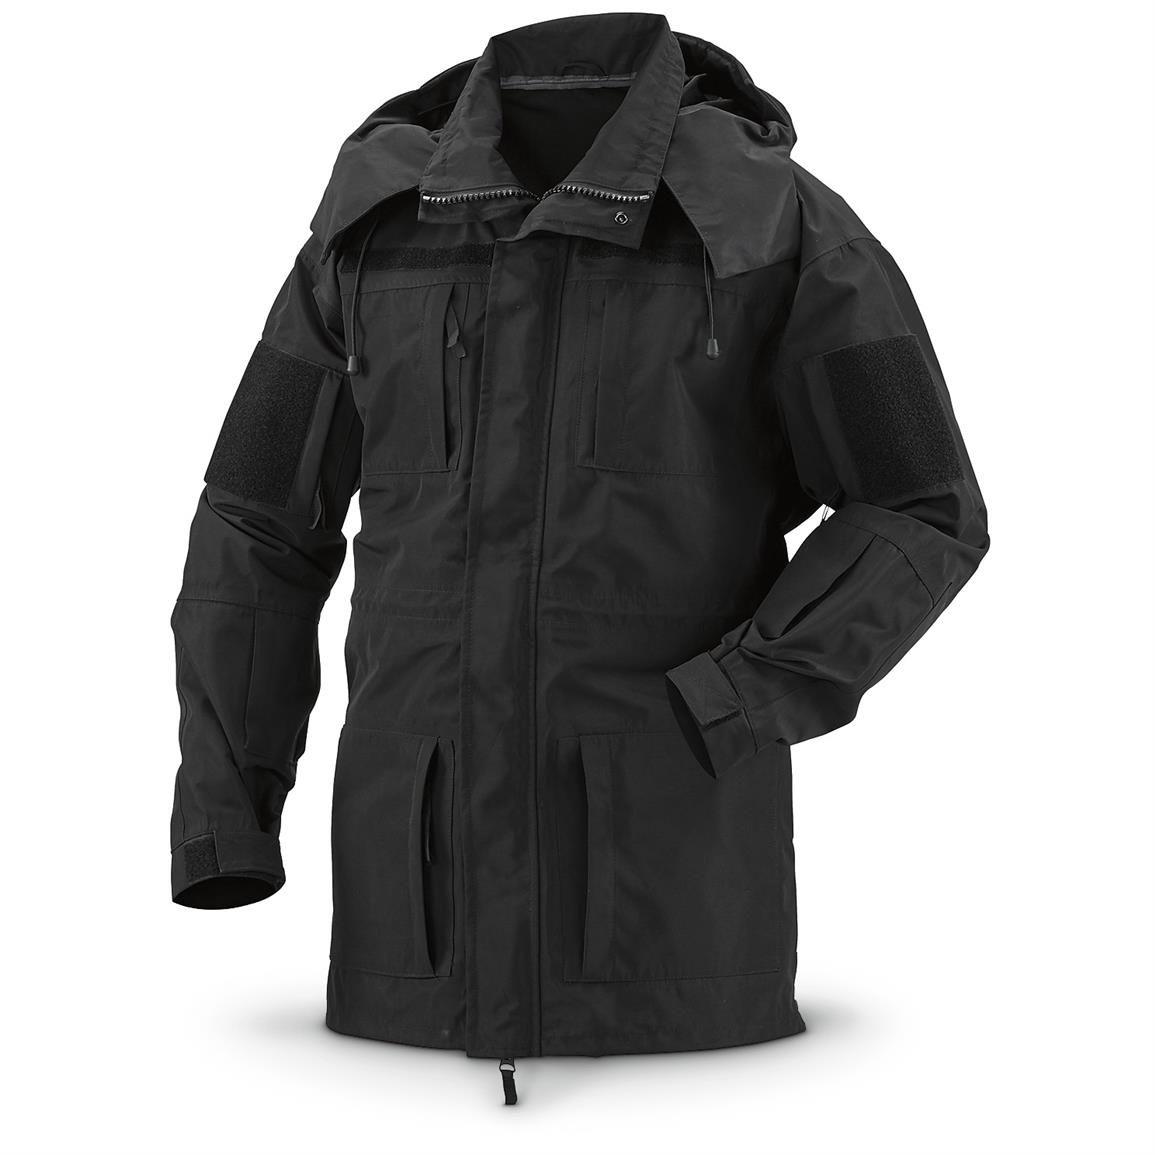 a48ddee1a42 Mil-Tec Waterproof Breathable ECW Jacket